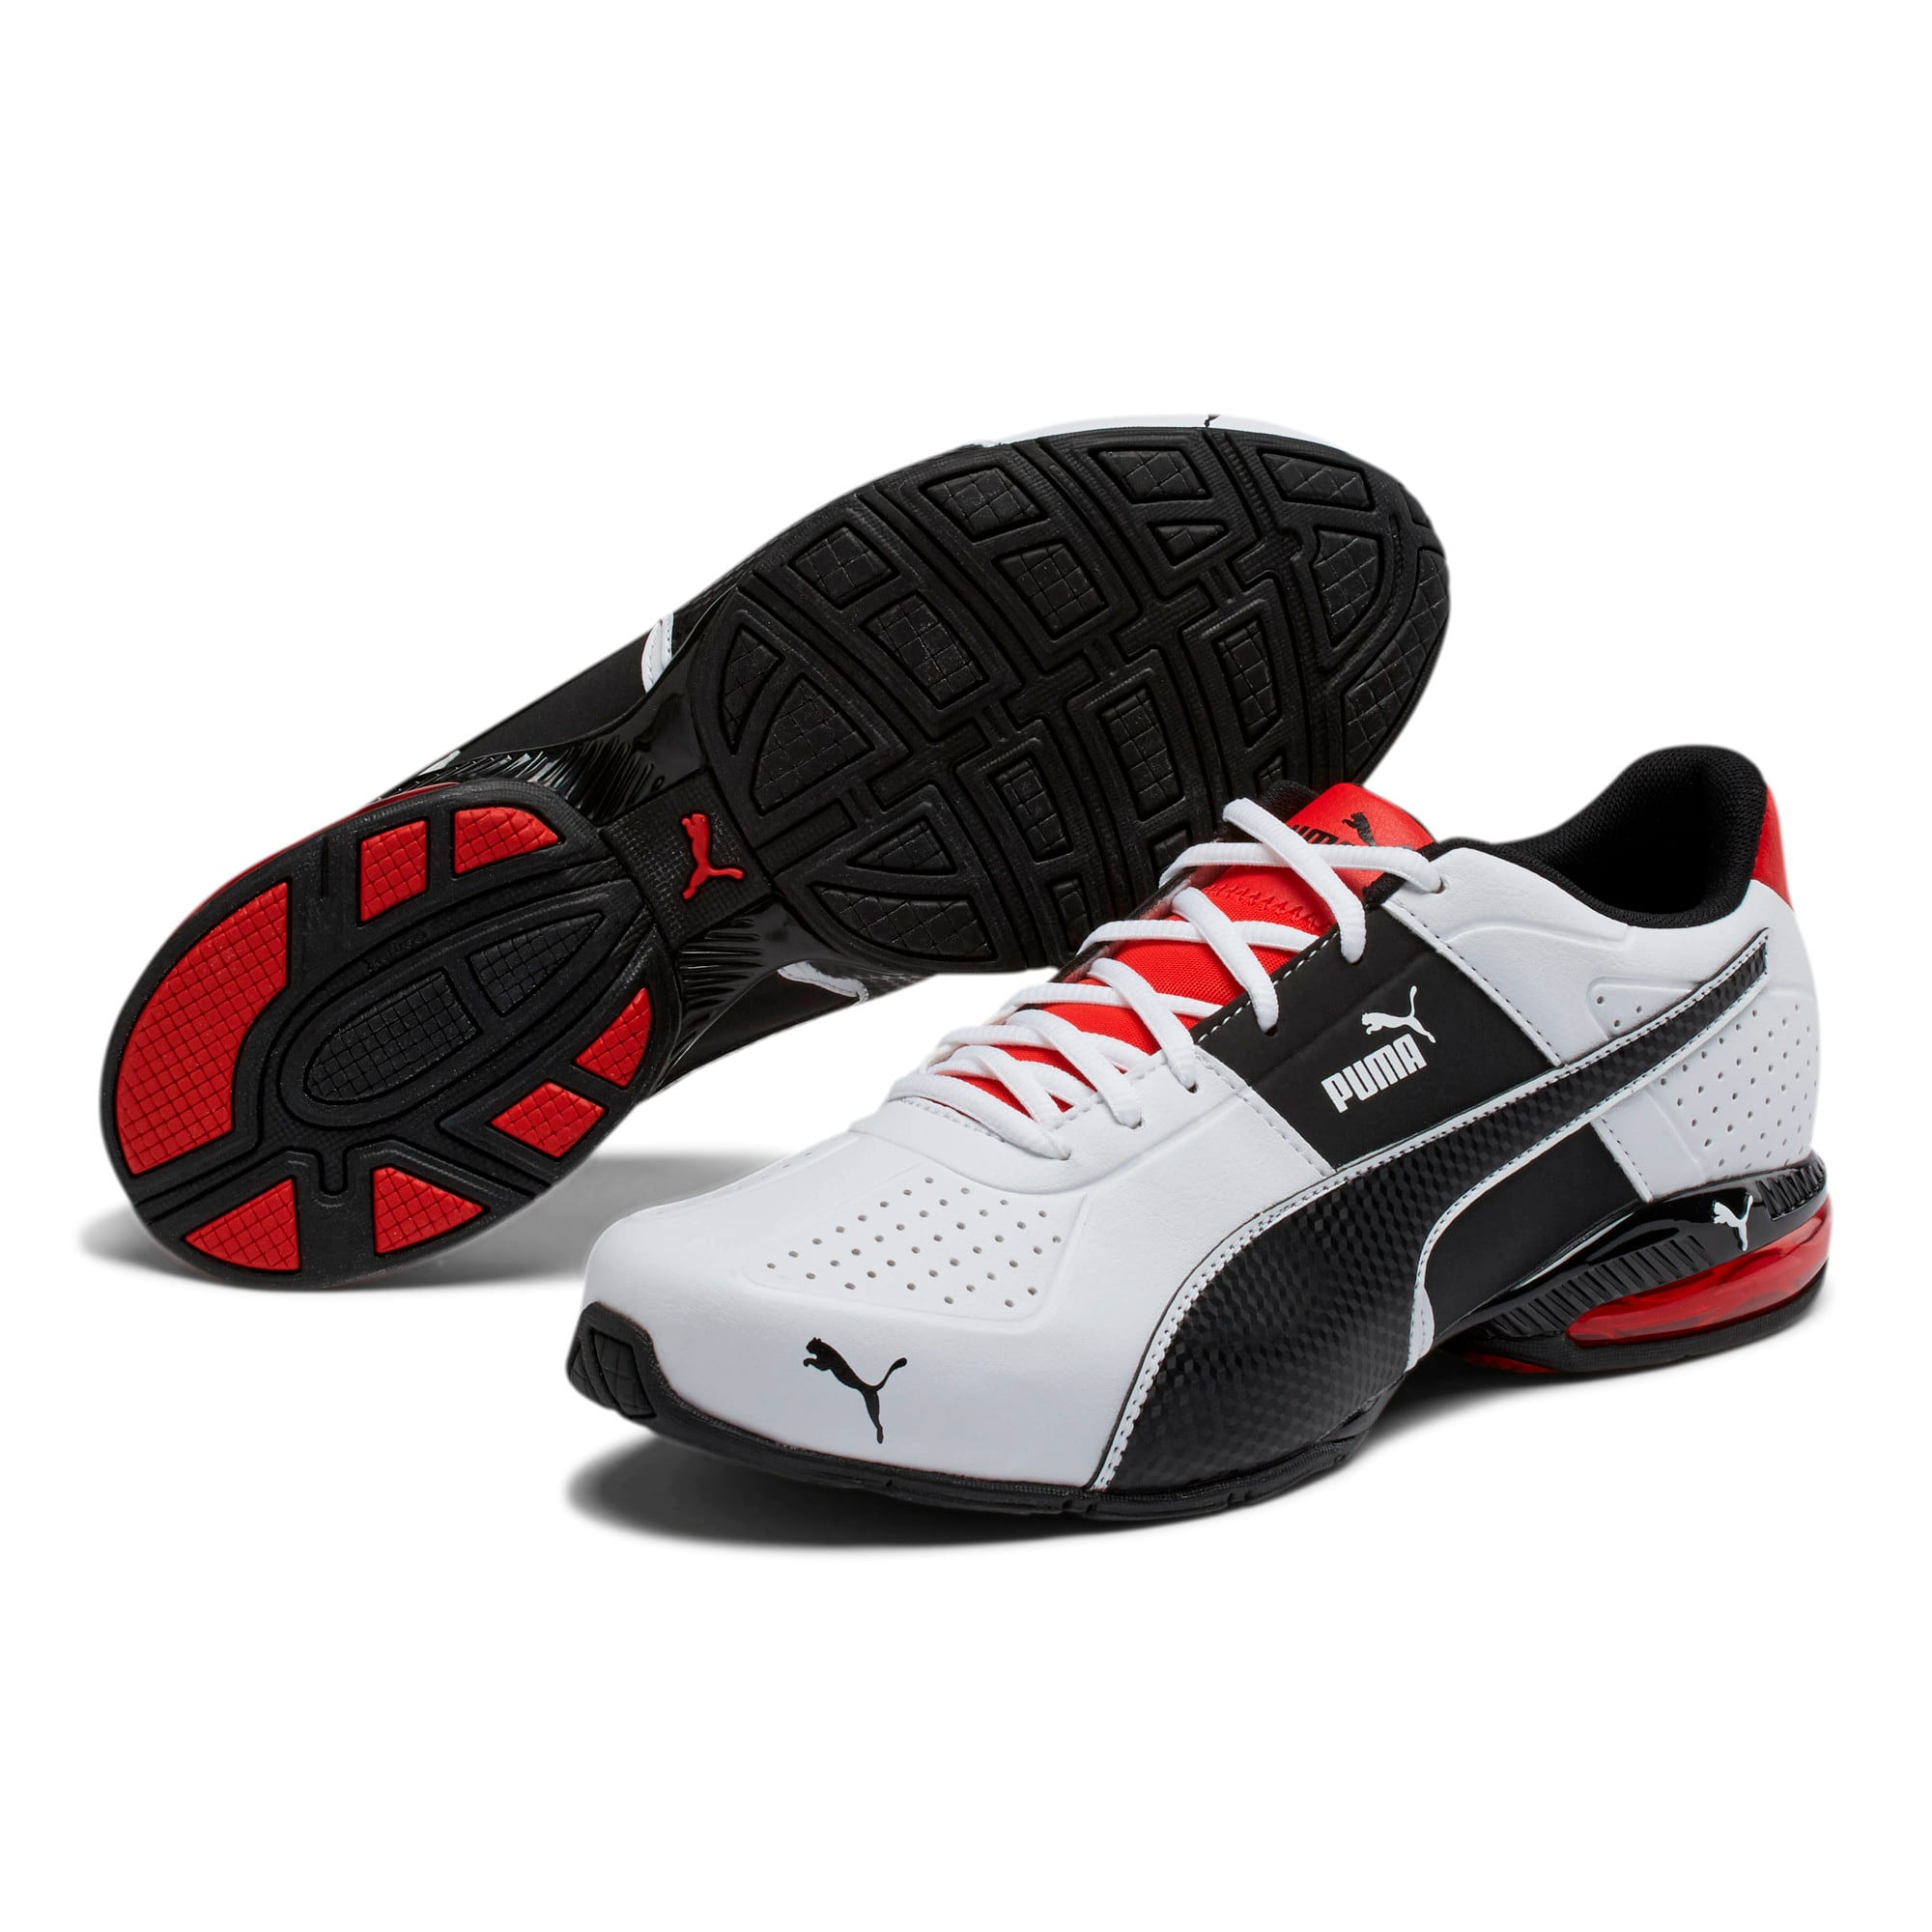 Thumbnail 2 of CELL Surin 2 FM Men's Running Shoes, White-Black-flame scarlet, medium